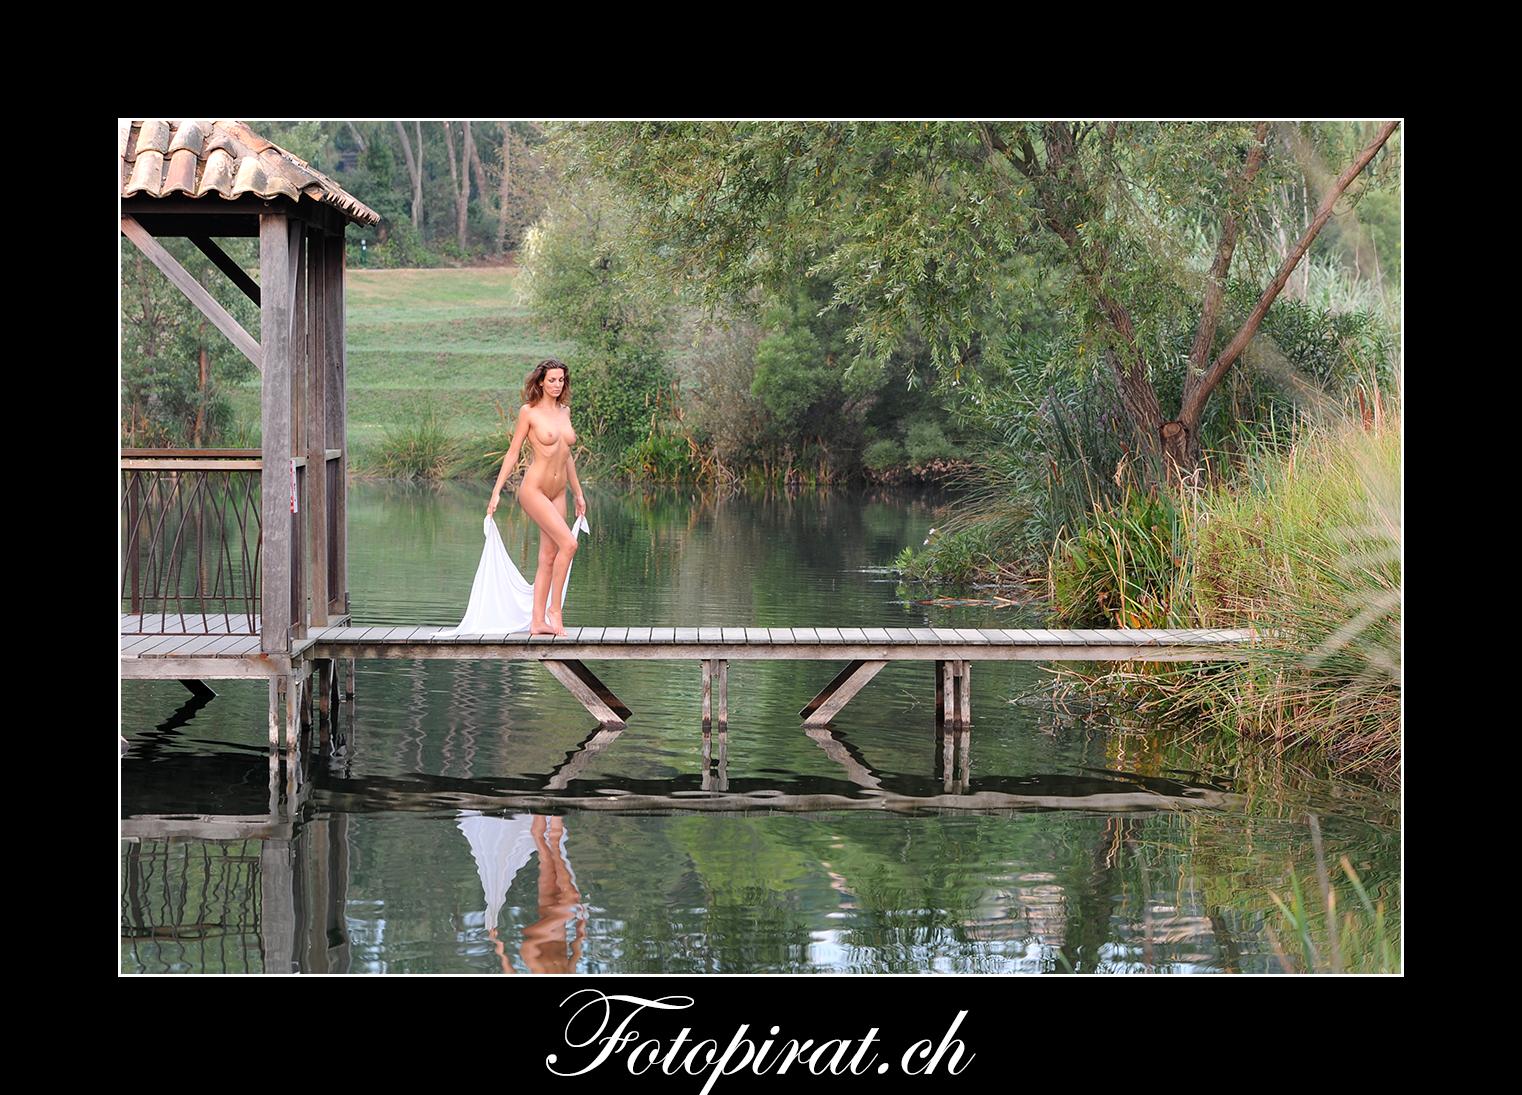 Fotoshooting, outdoor, Akt, Nackt, Nudeart, Nude, Modelagentur, Fotomodel, Sunrise, erotik, fotomodel werden, Cote Azure